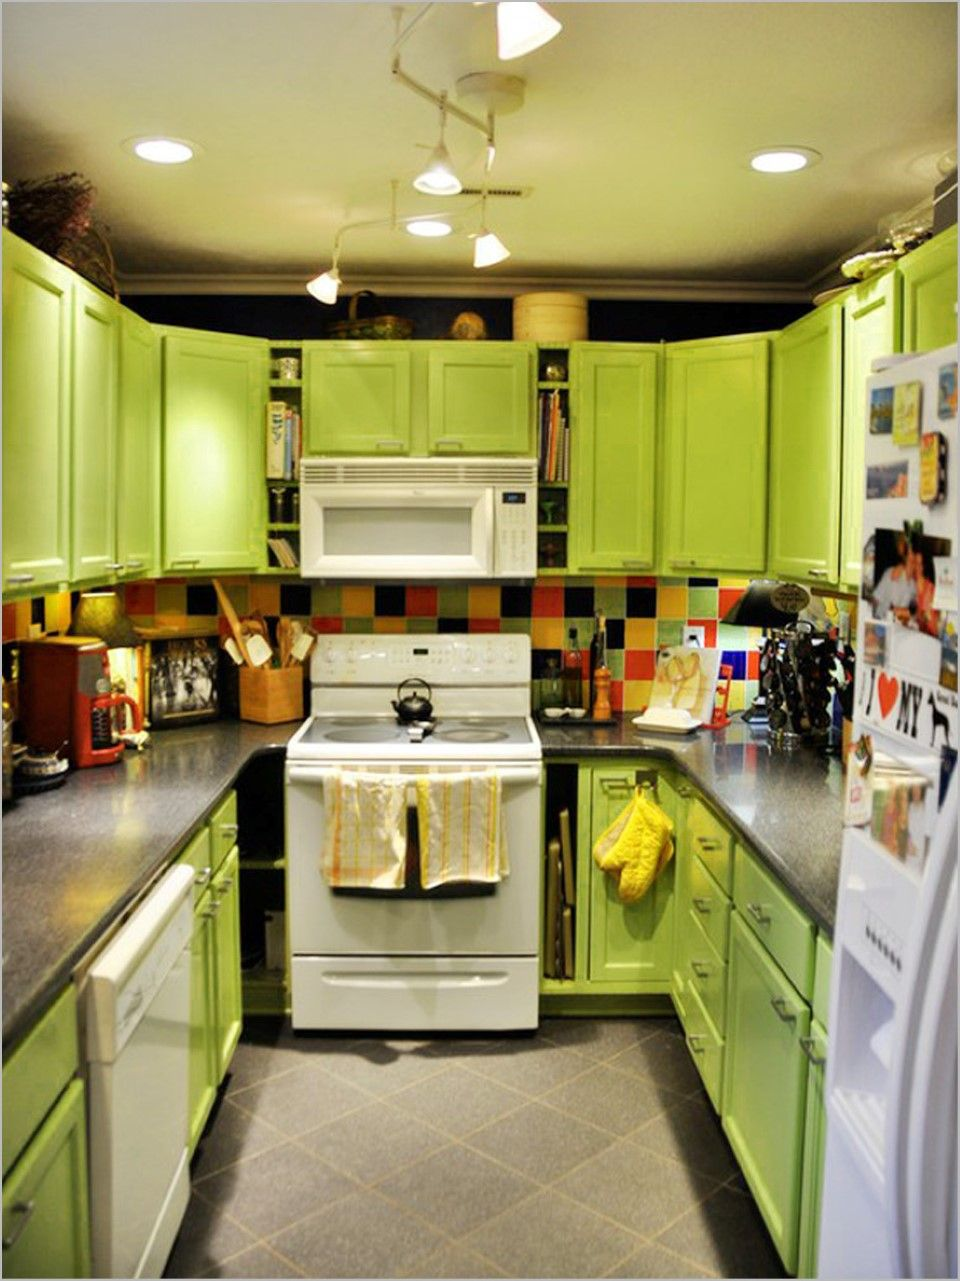 Kitchen pleasing circular track lighting with green kitchen set plus kitchen pleasing circular track lighting with green kitchen set plus colourful kitchen backsplash tile these backsplash aloadofball Images